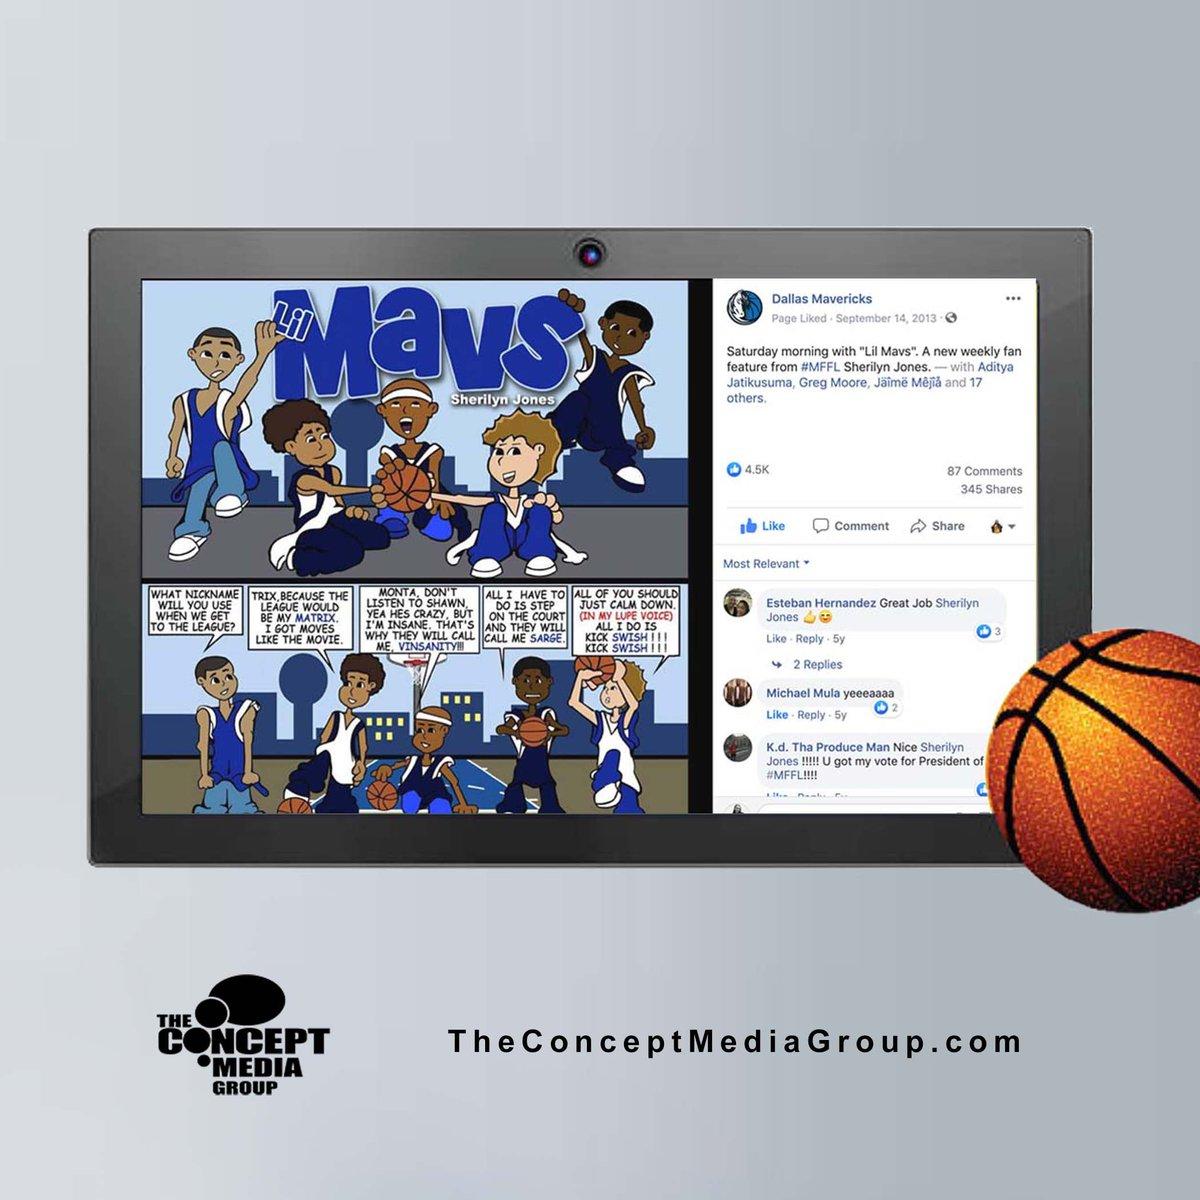 Created a comic called Lil Mavs for Dallas Mavs social pages some years ago. Time fly's!!!!. #mffl 🏀  Illustrator  ✏: @jonesherilyn  #TheConceptMG #comicstrip #comics #cartoon #webcomic #illustration #webcomics #comicstrips #nba #ballislife #basketball #dirk #dallasmavericks